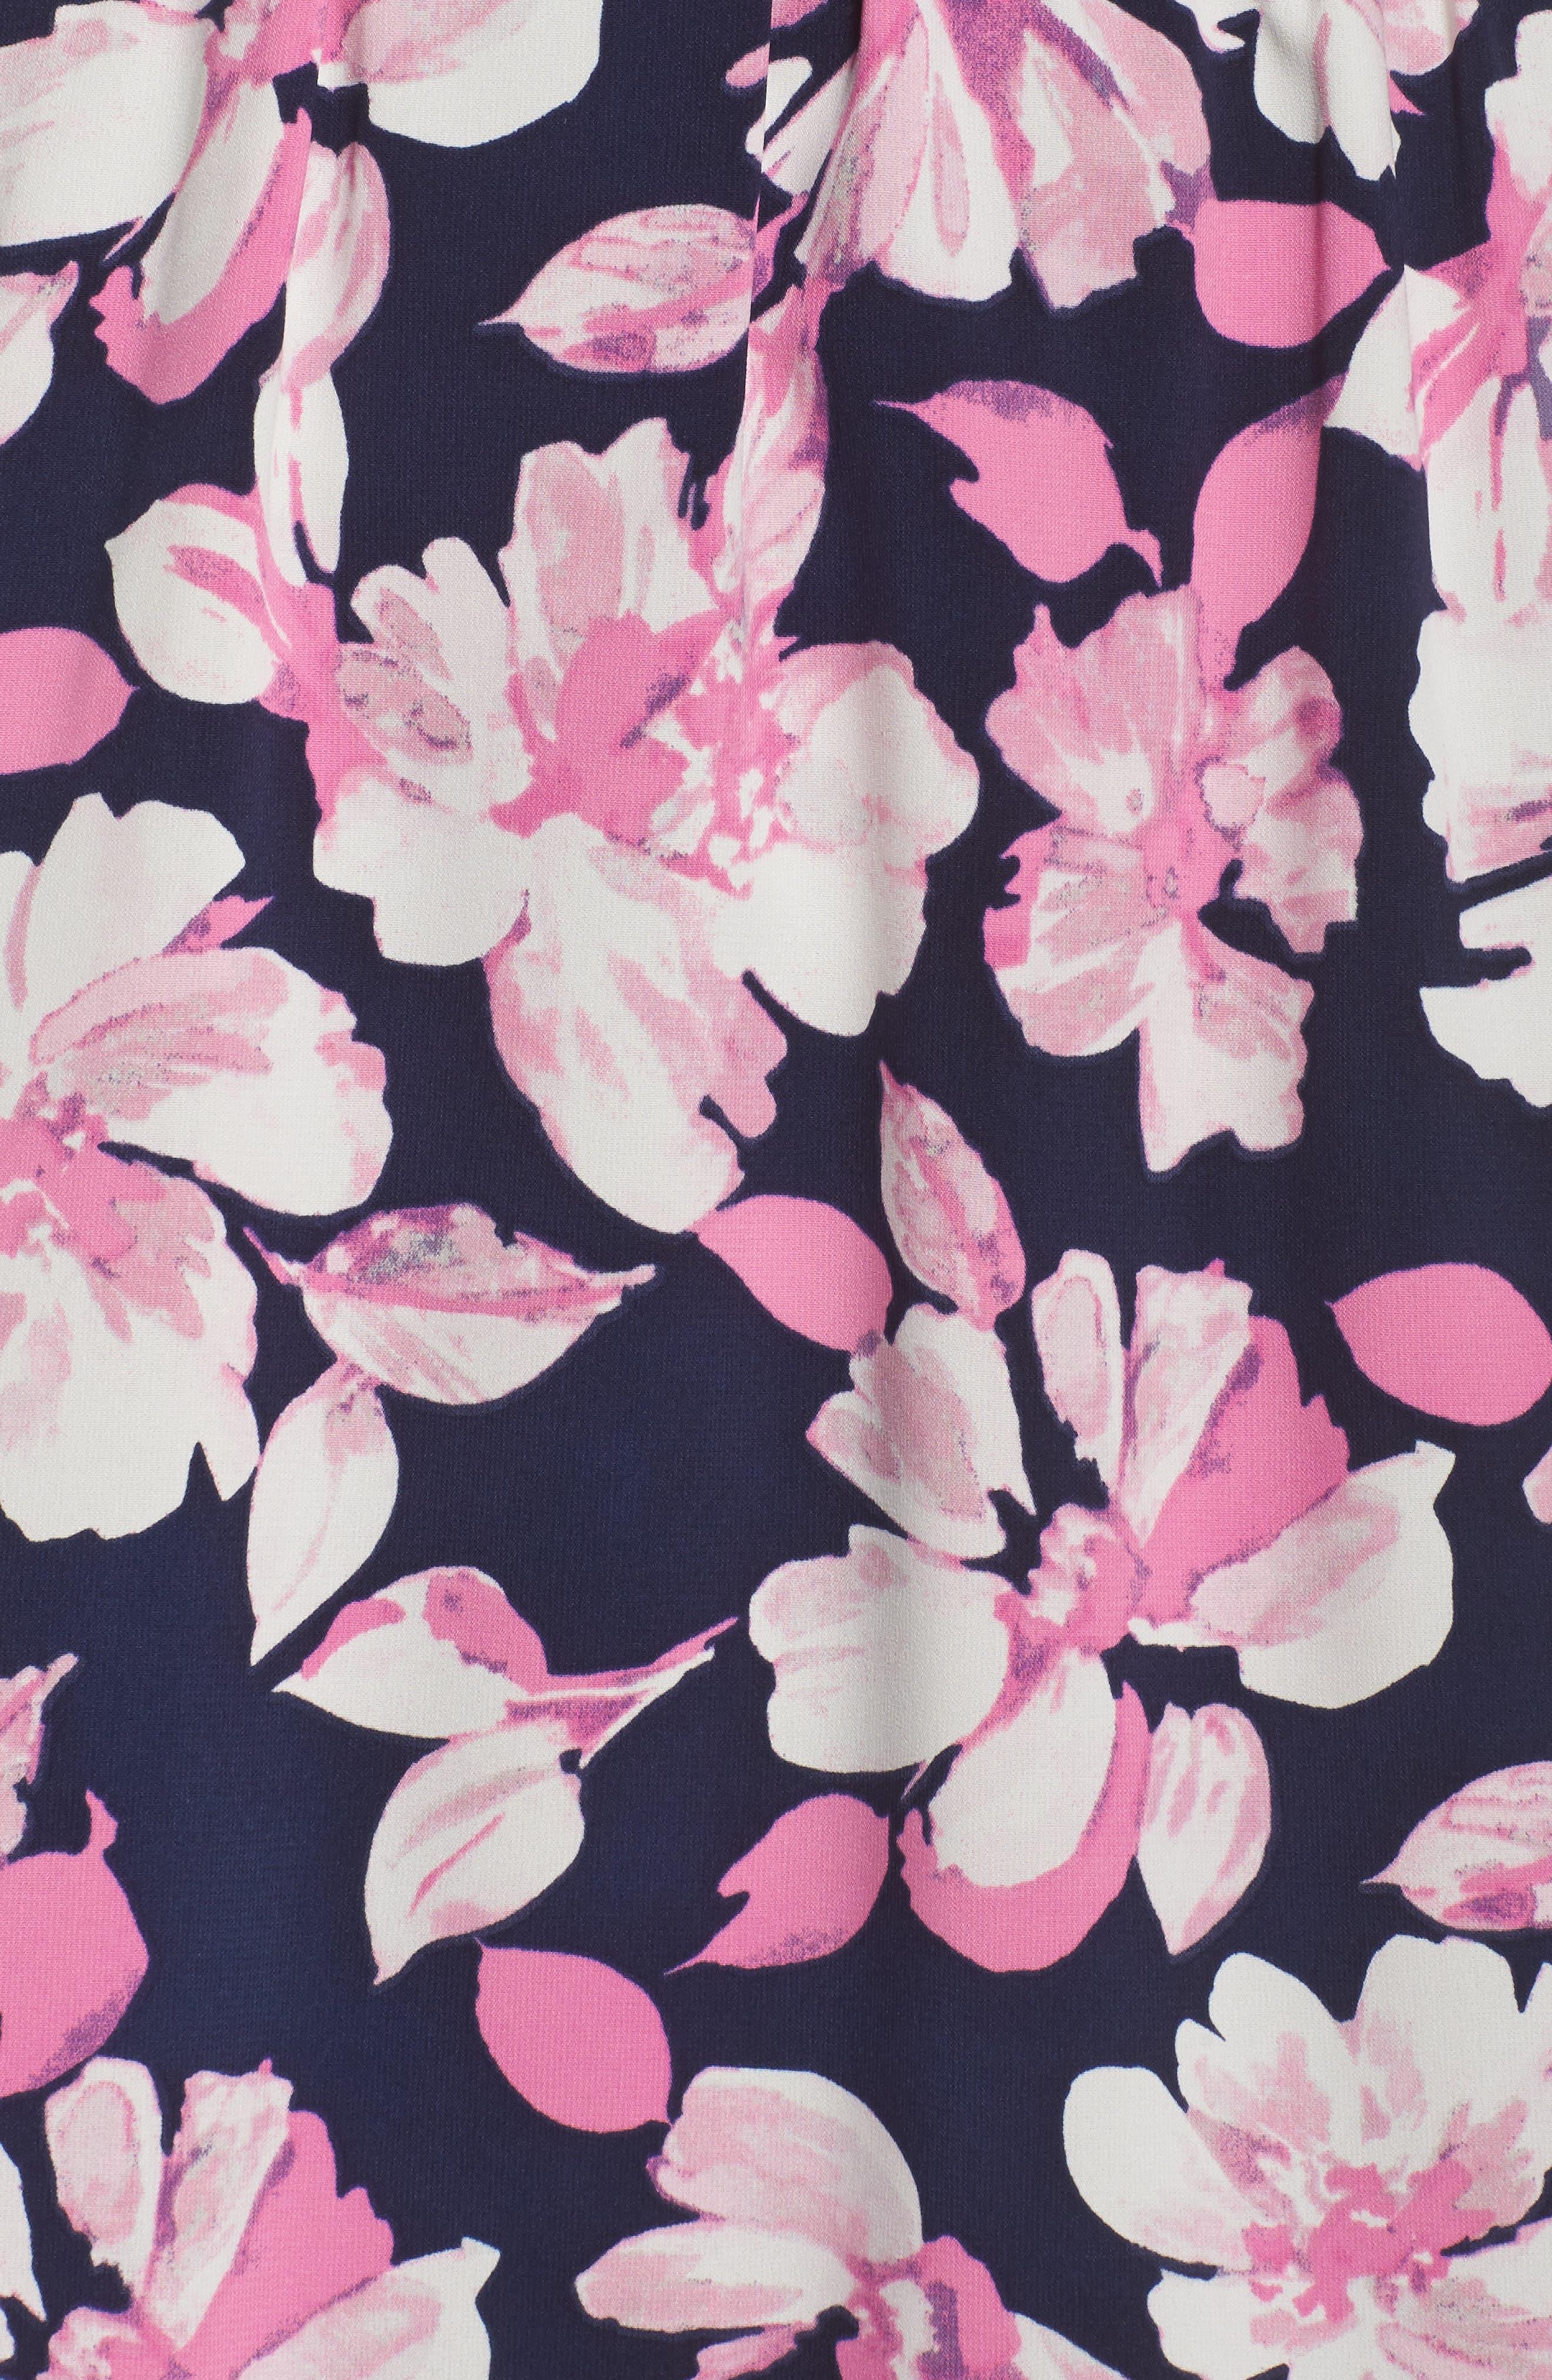 Print Faux Wrap Dress,                             Alternate thumbnail 5, color,                             Navy/ Pink